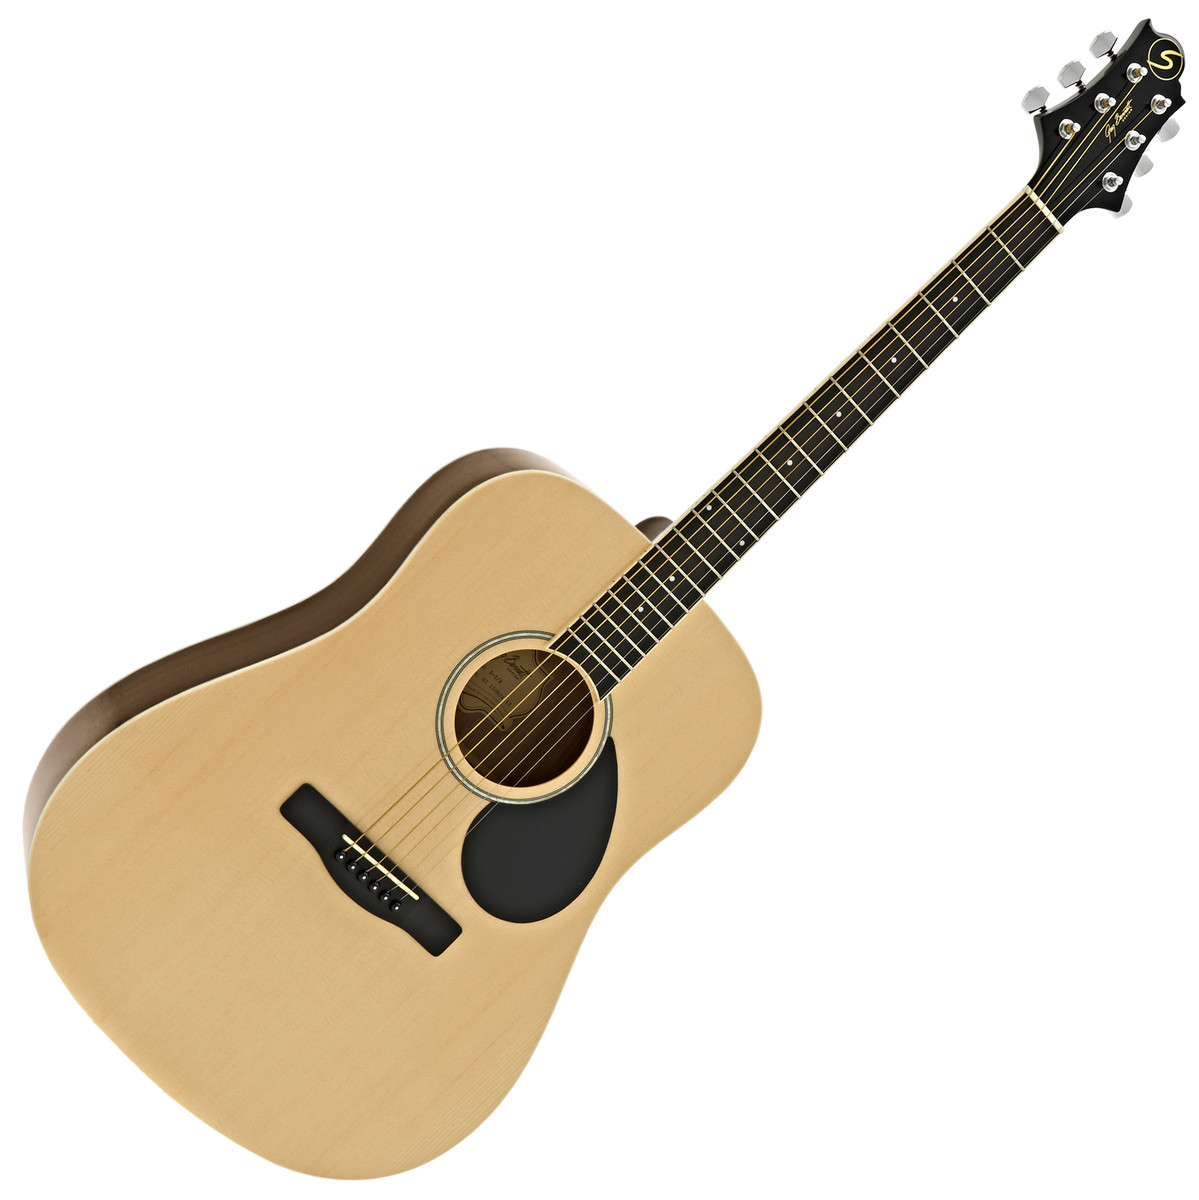 Image of Greg Bennett D-2 Acoustic Guitar Natural